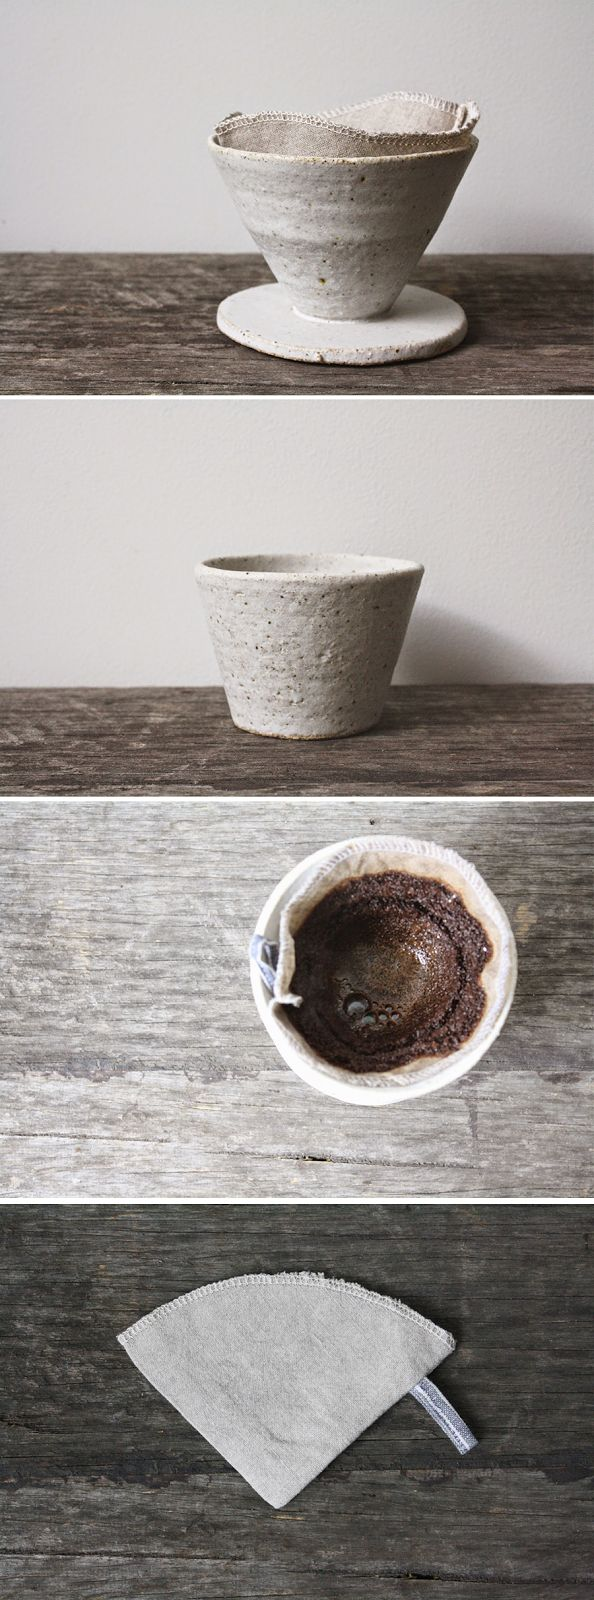 The pairing of coffee and ceramic art via HEIMELIG blog